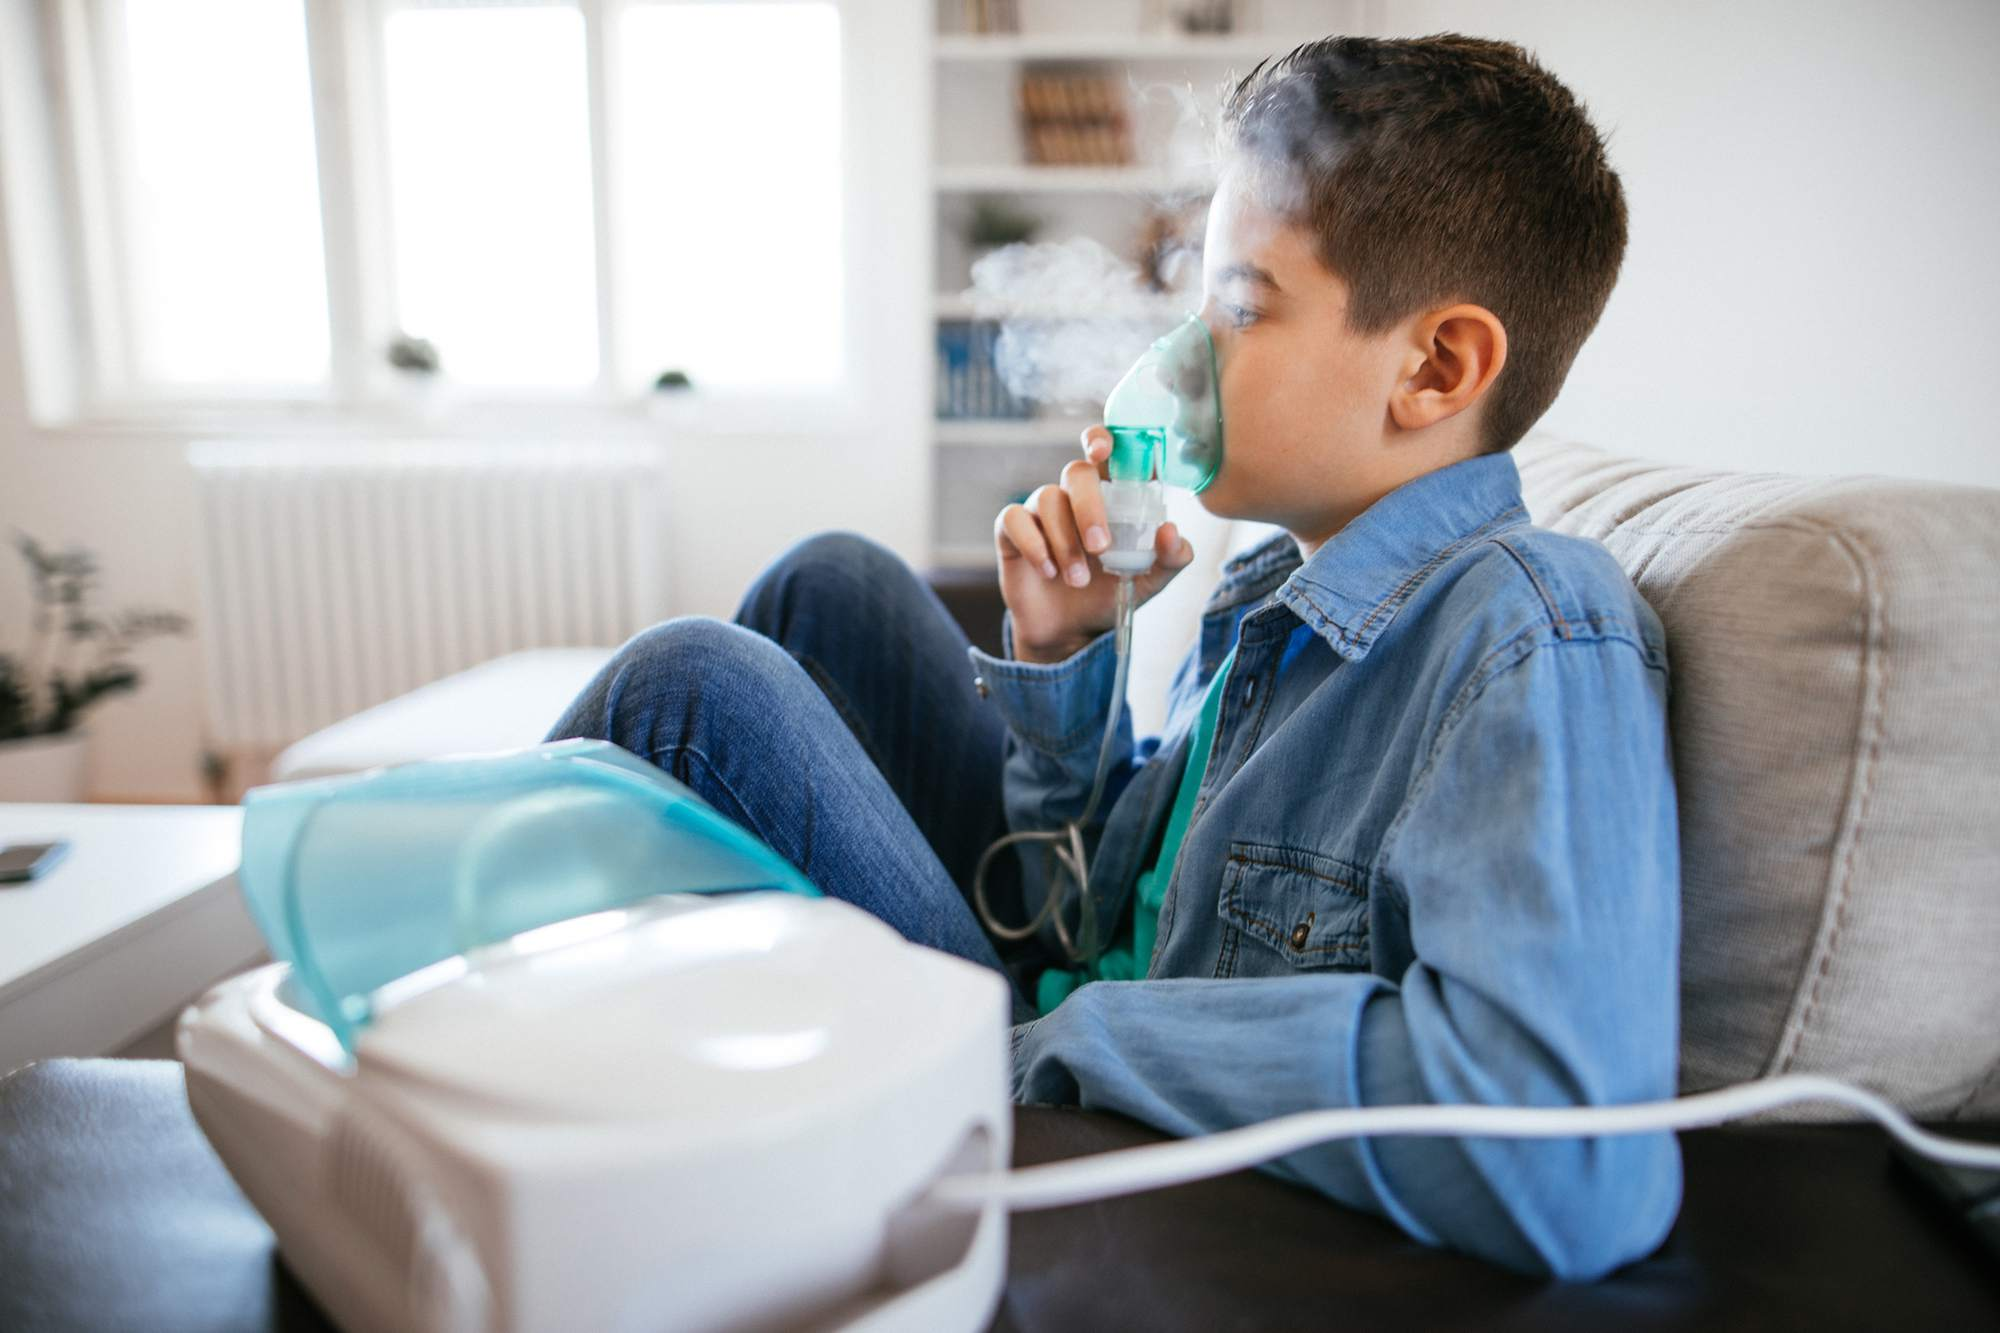 جلسات استنشاق البخار للاطفال